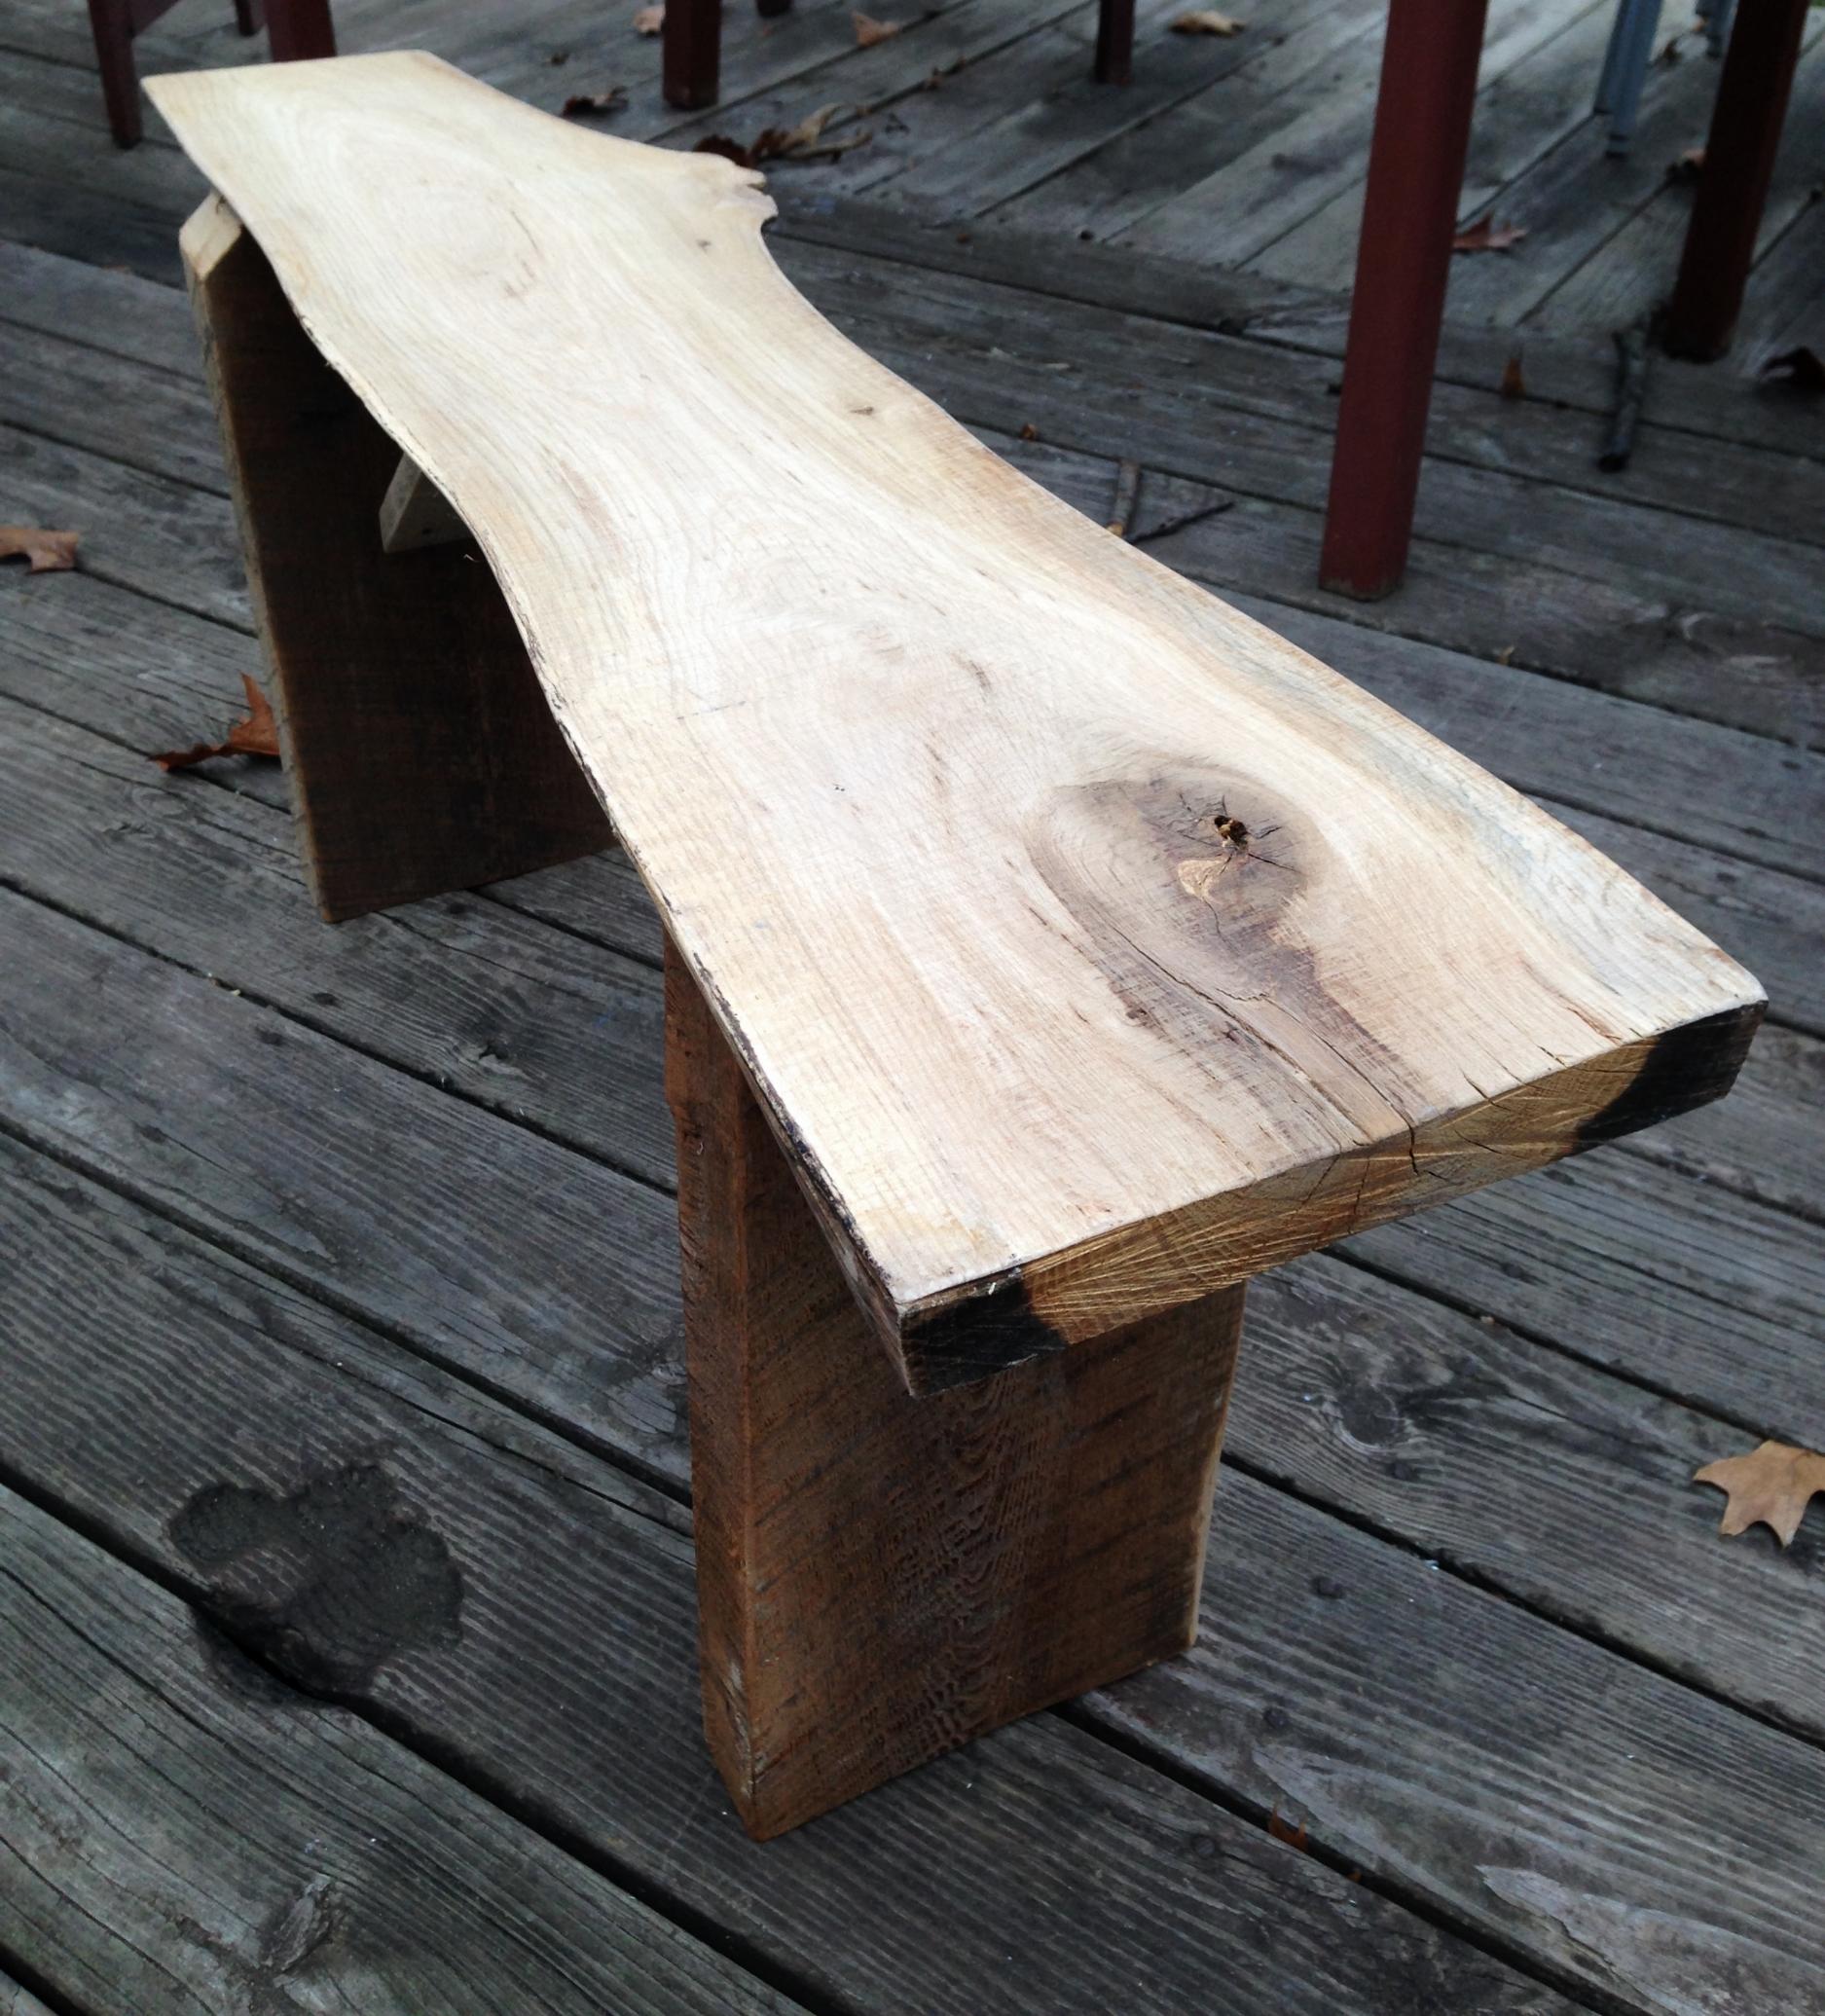 Rough Hewn Natural Bench - $70